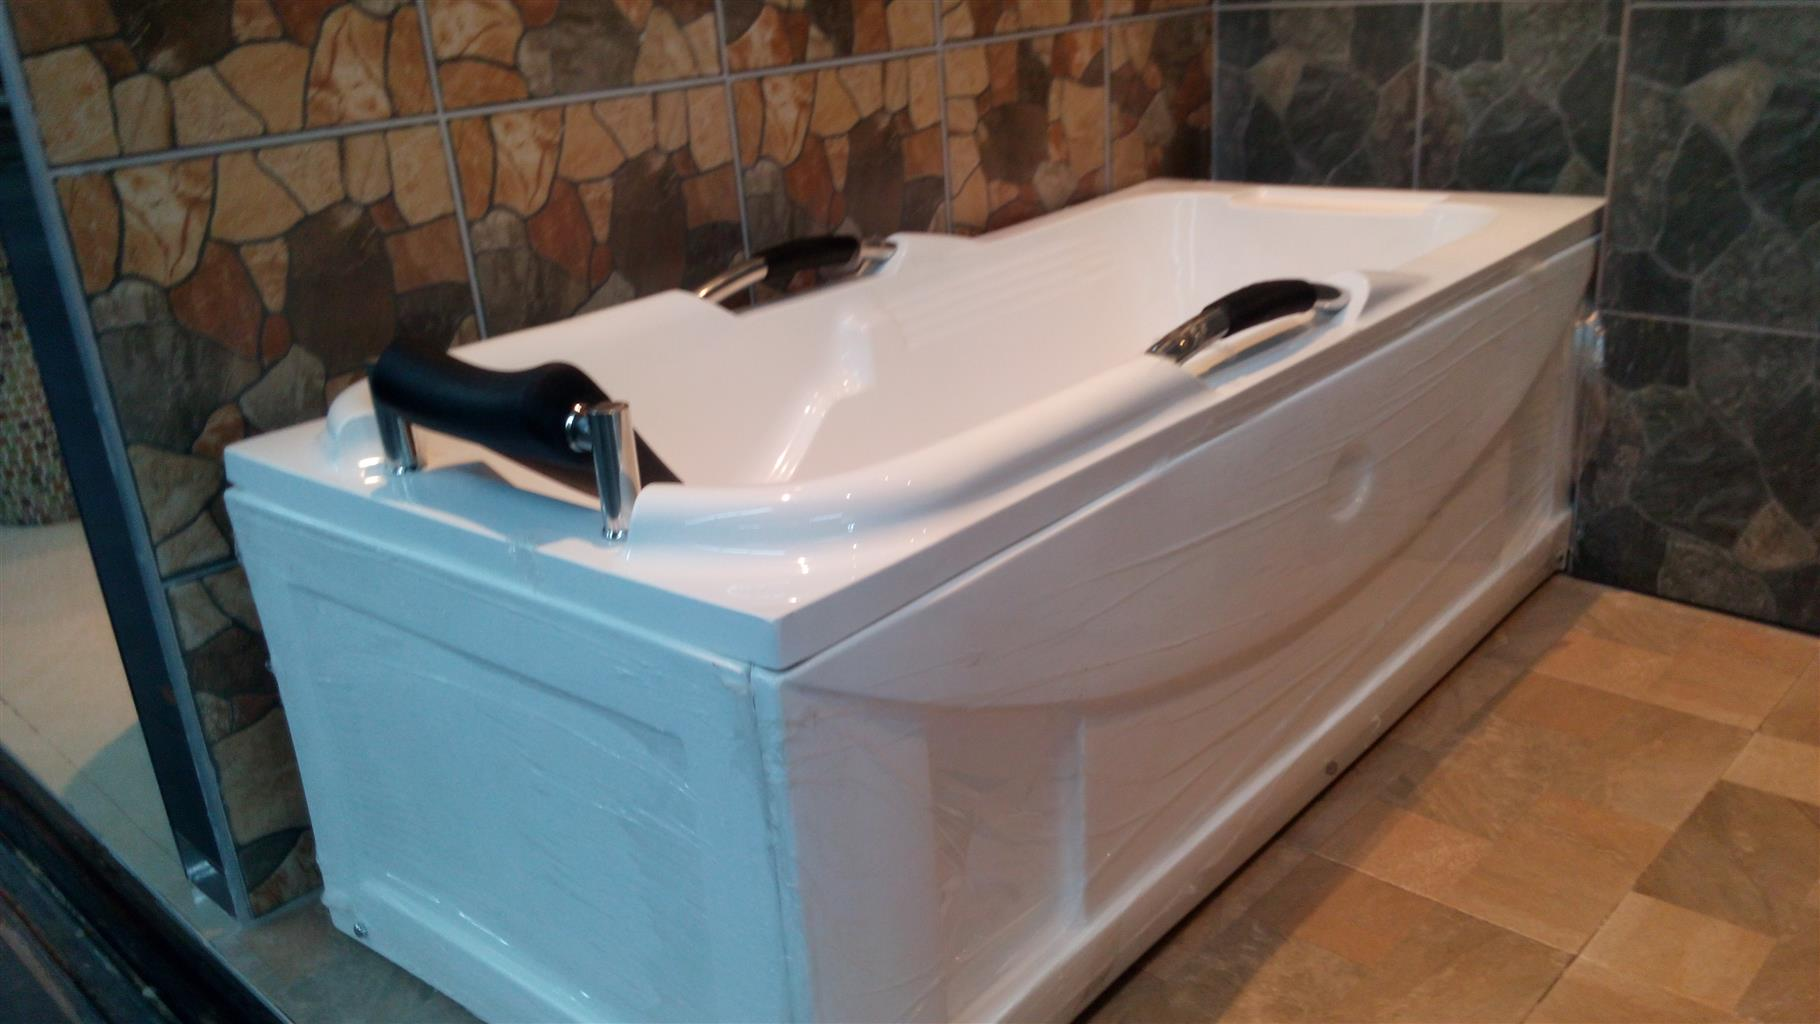 BATH TUB EXCLUSIVE